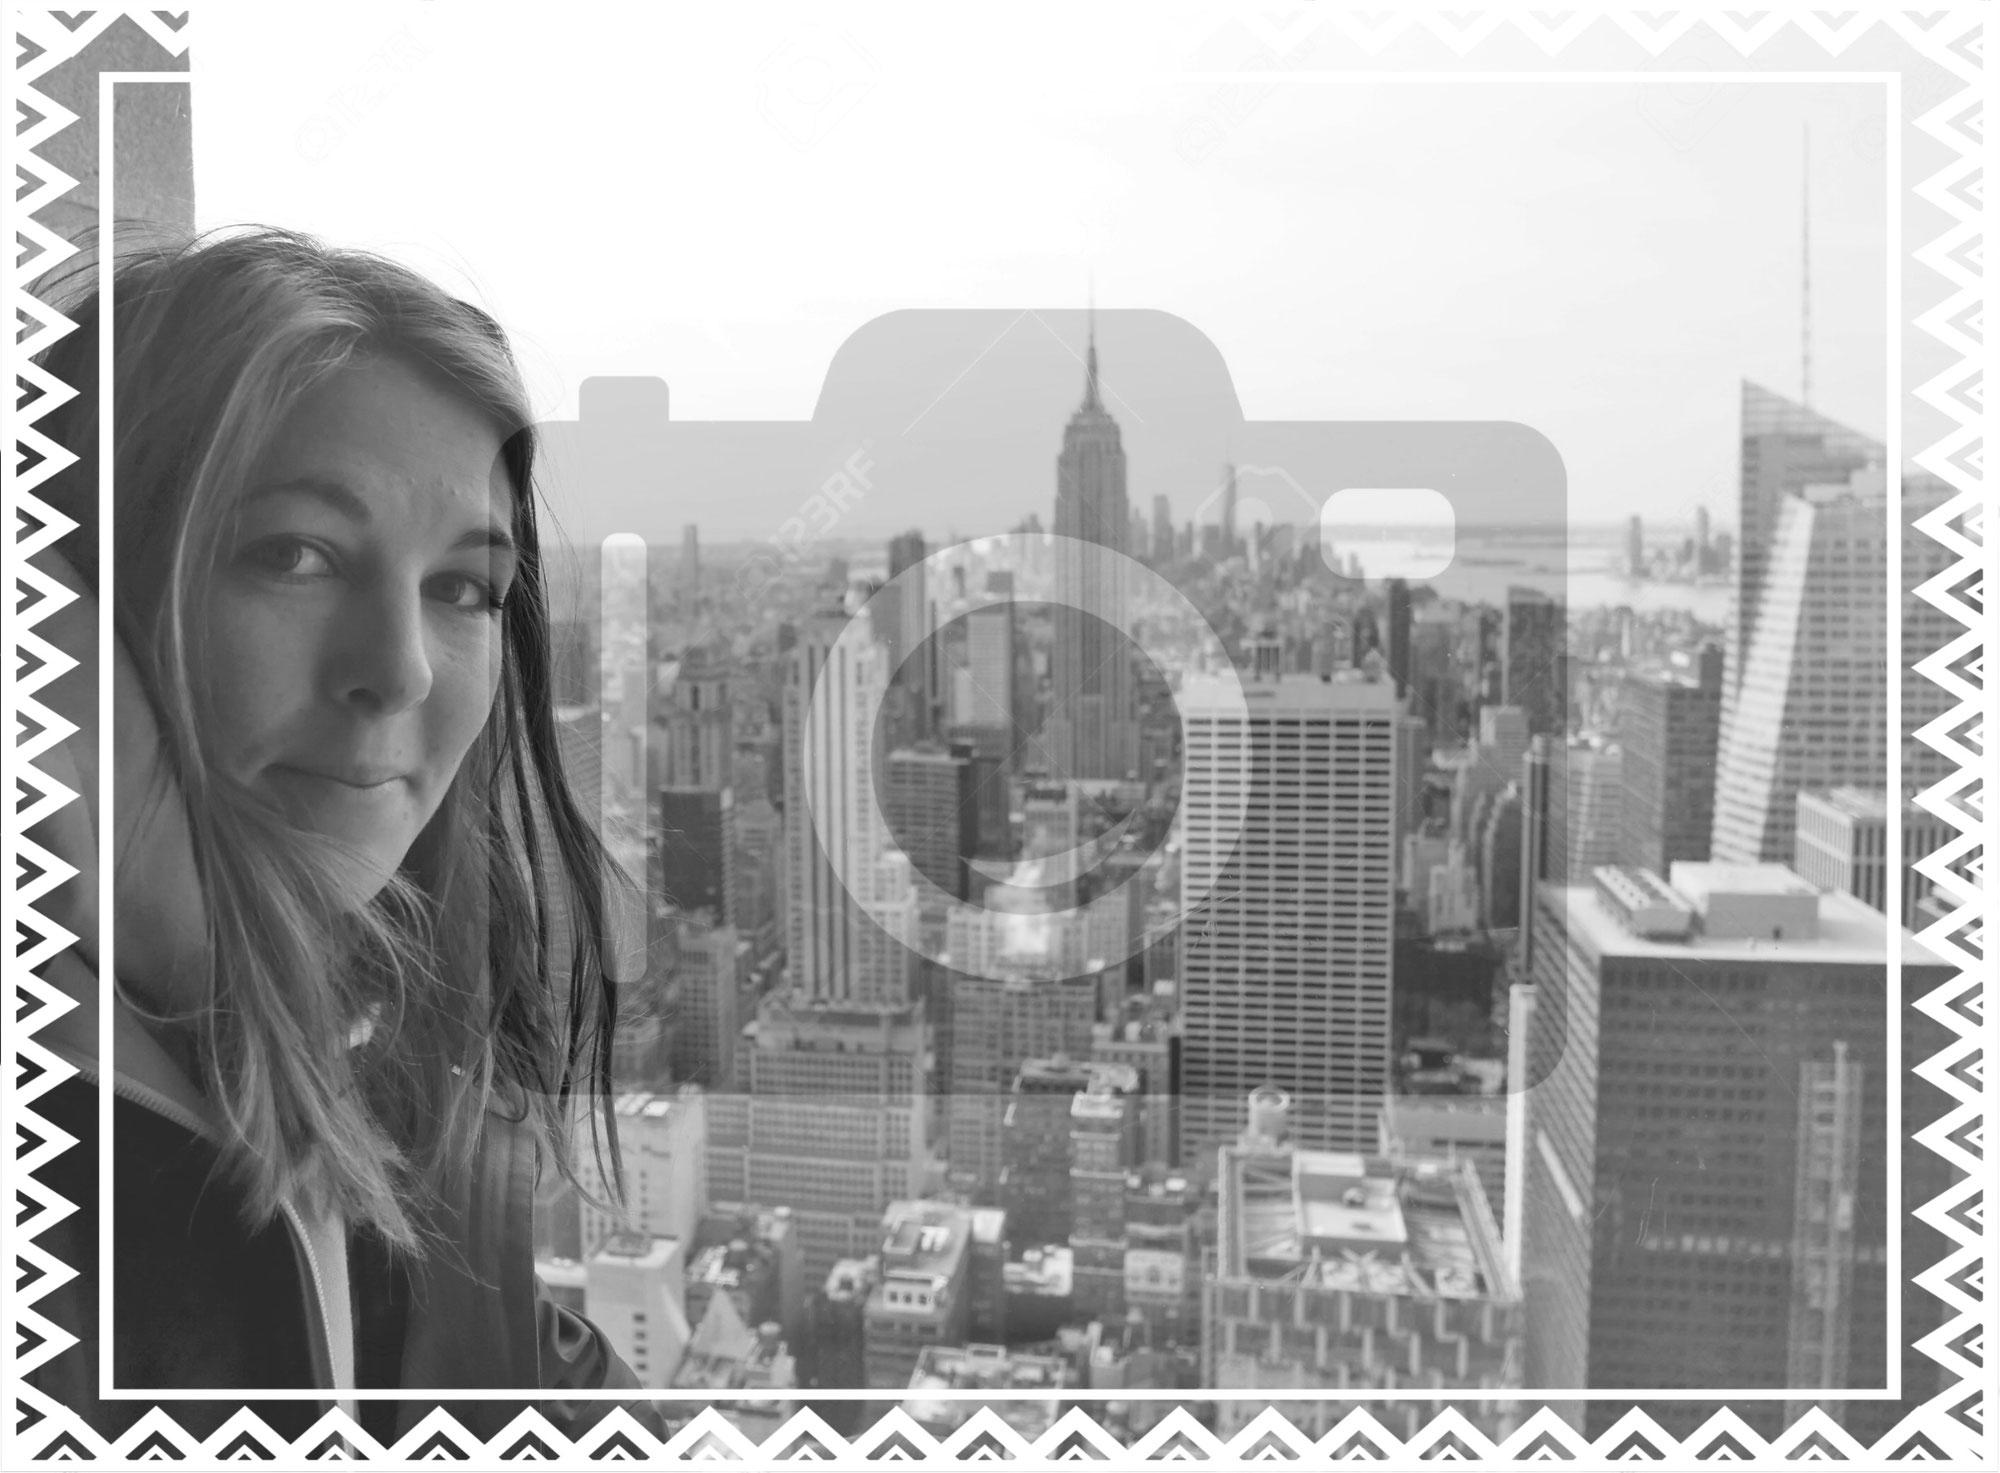 NYC en images